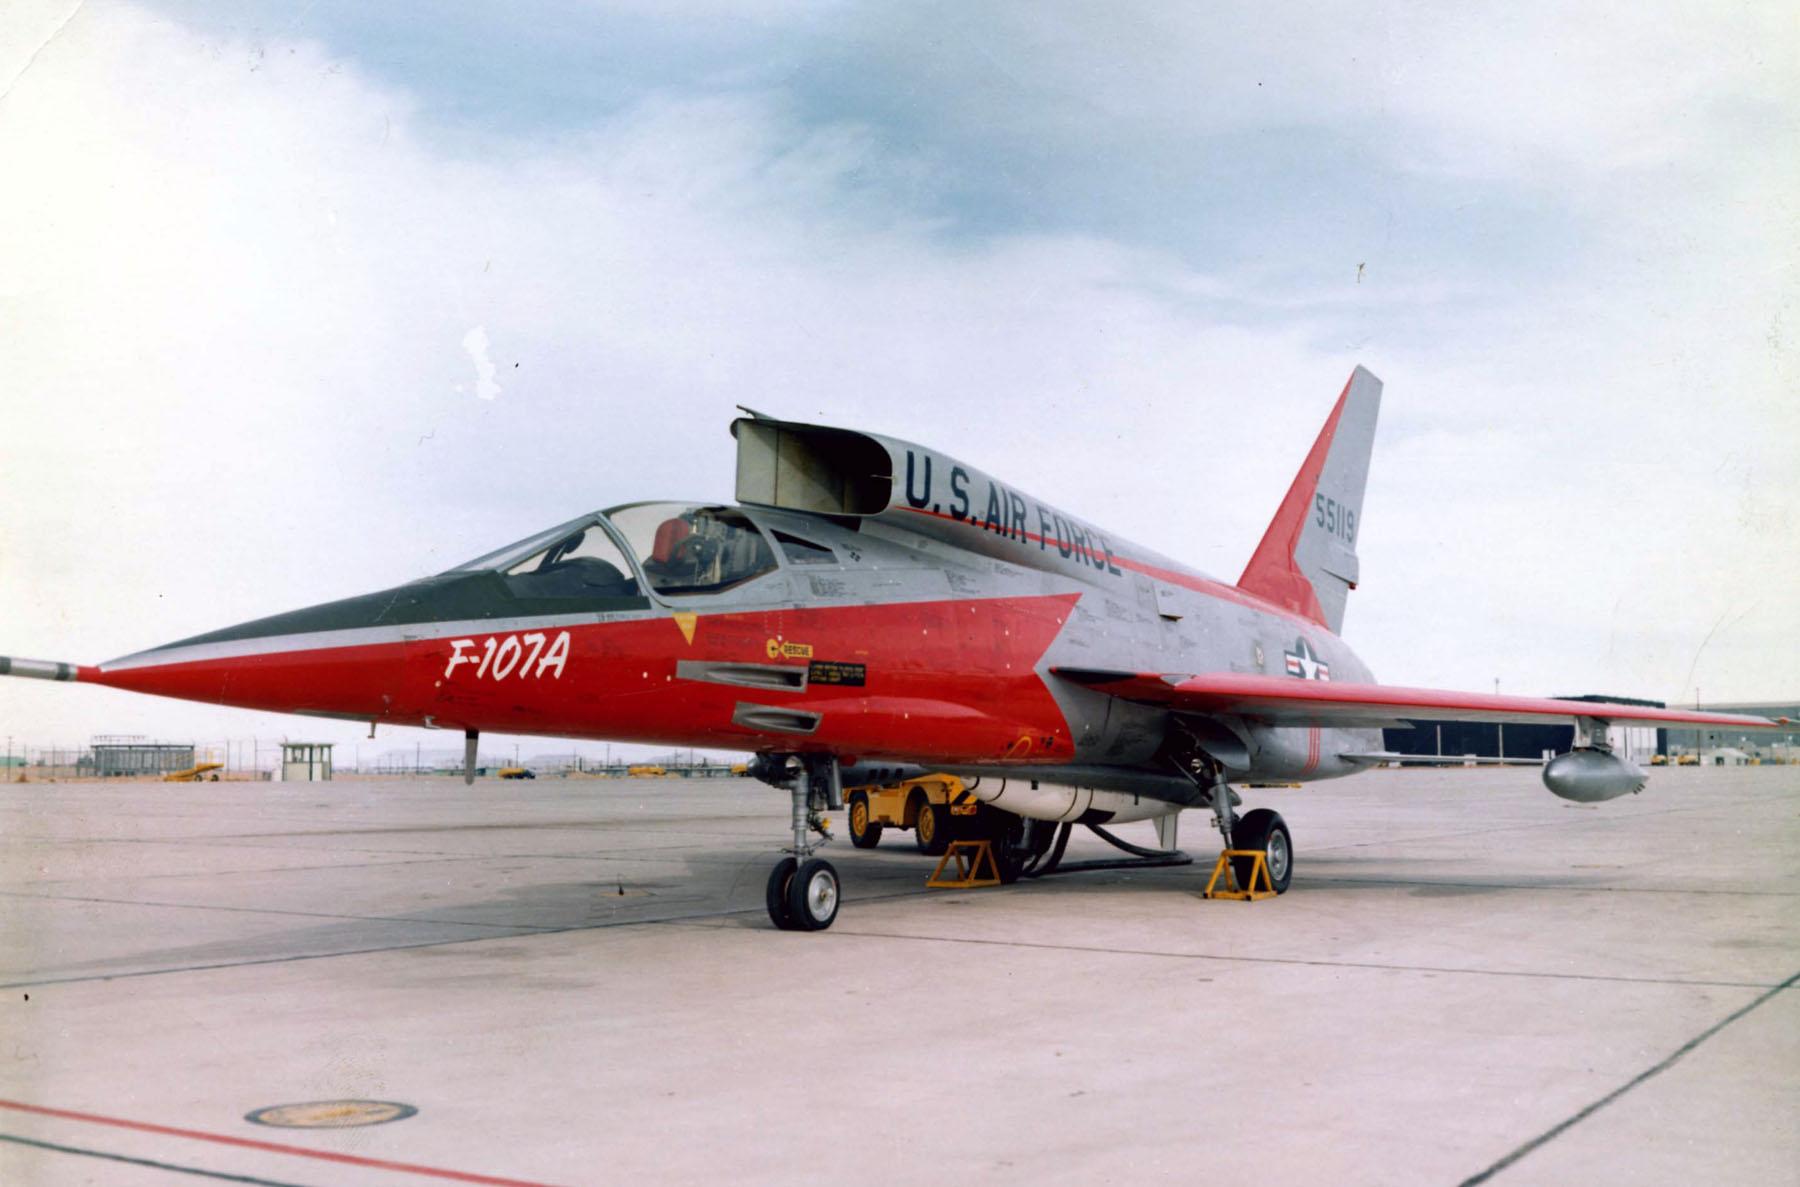 North American F-107A S/N 55-5119